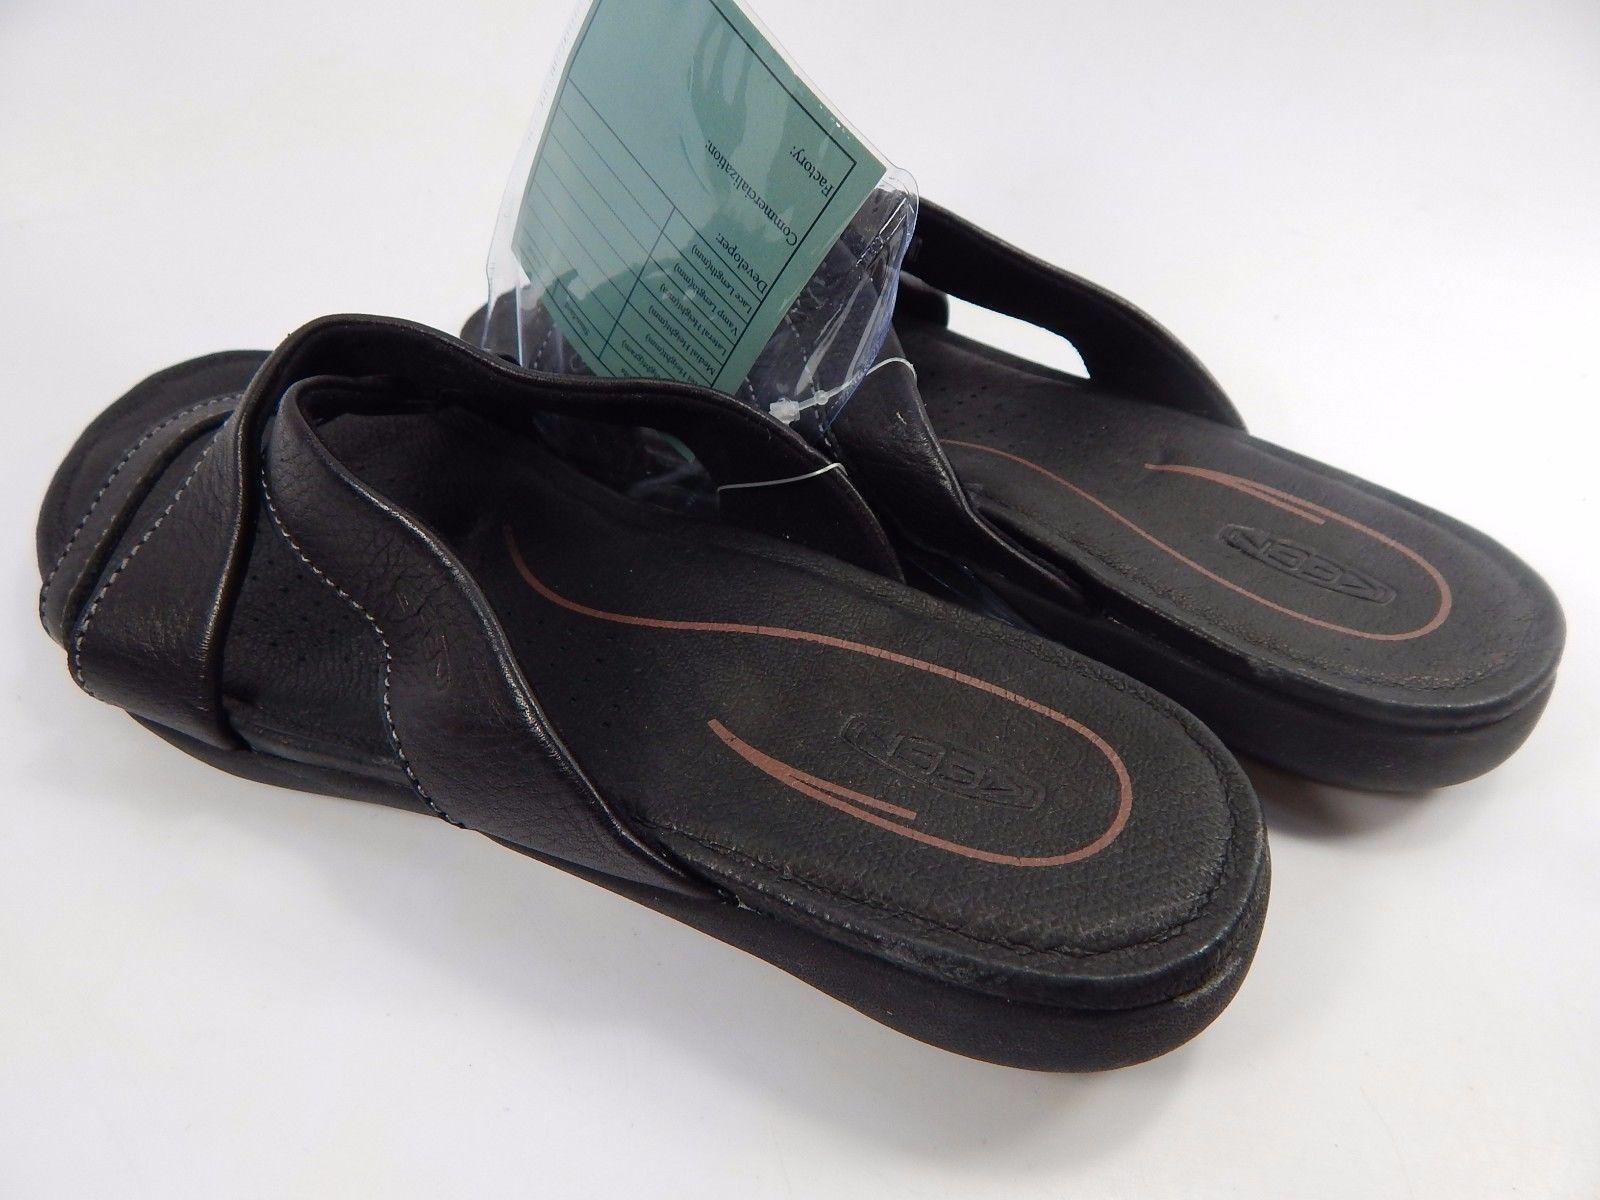 Keen Rose City Slide Women's Sports Sandals Size US 7 M (B) EU 37.5 BLACK